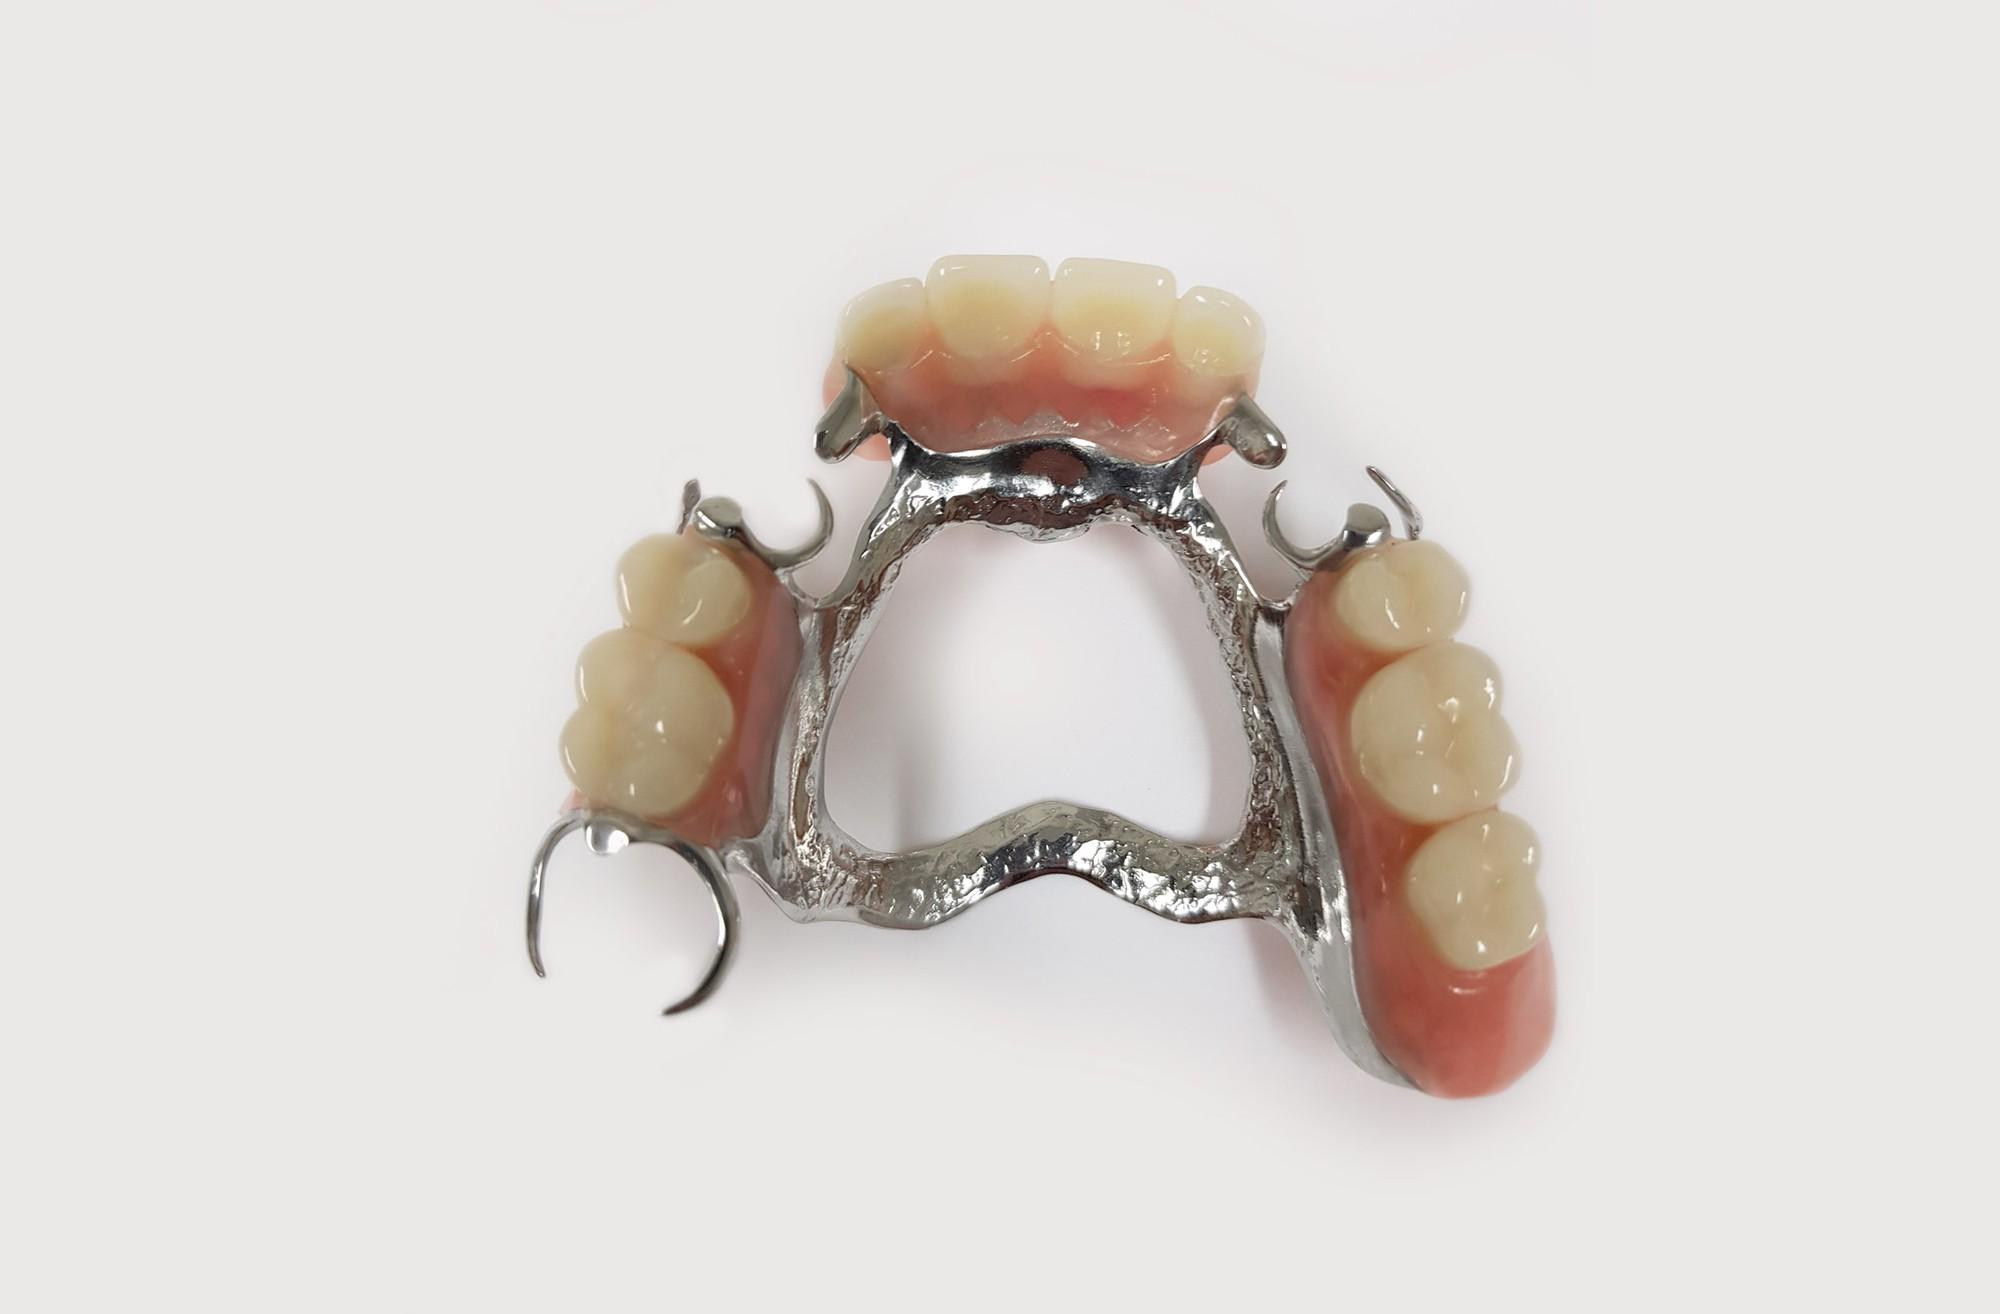 metal-frame-partial-dentures